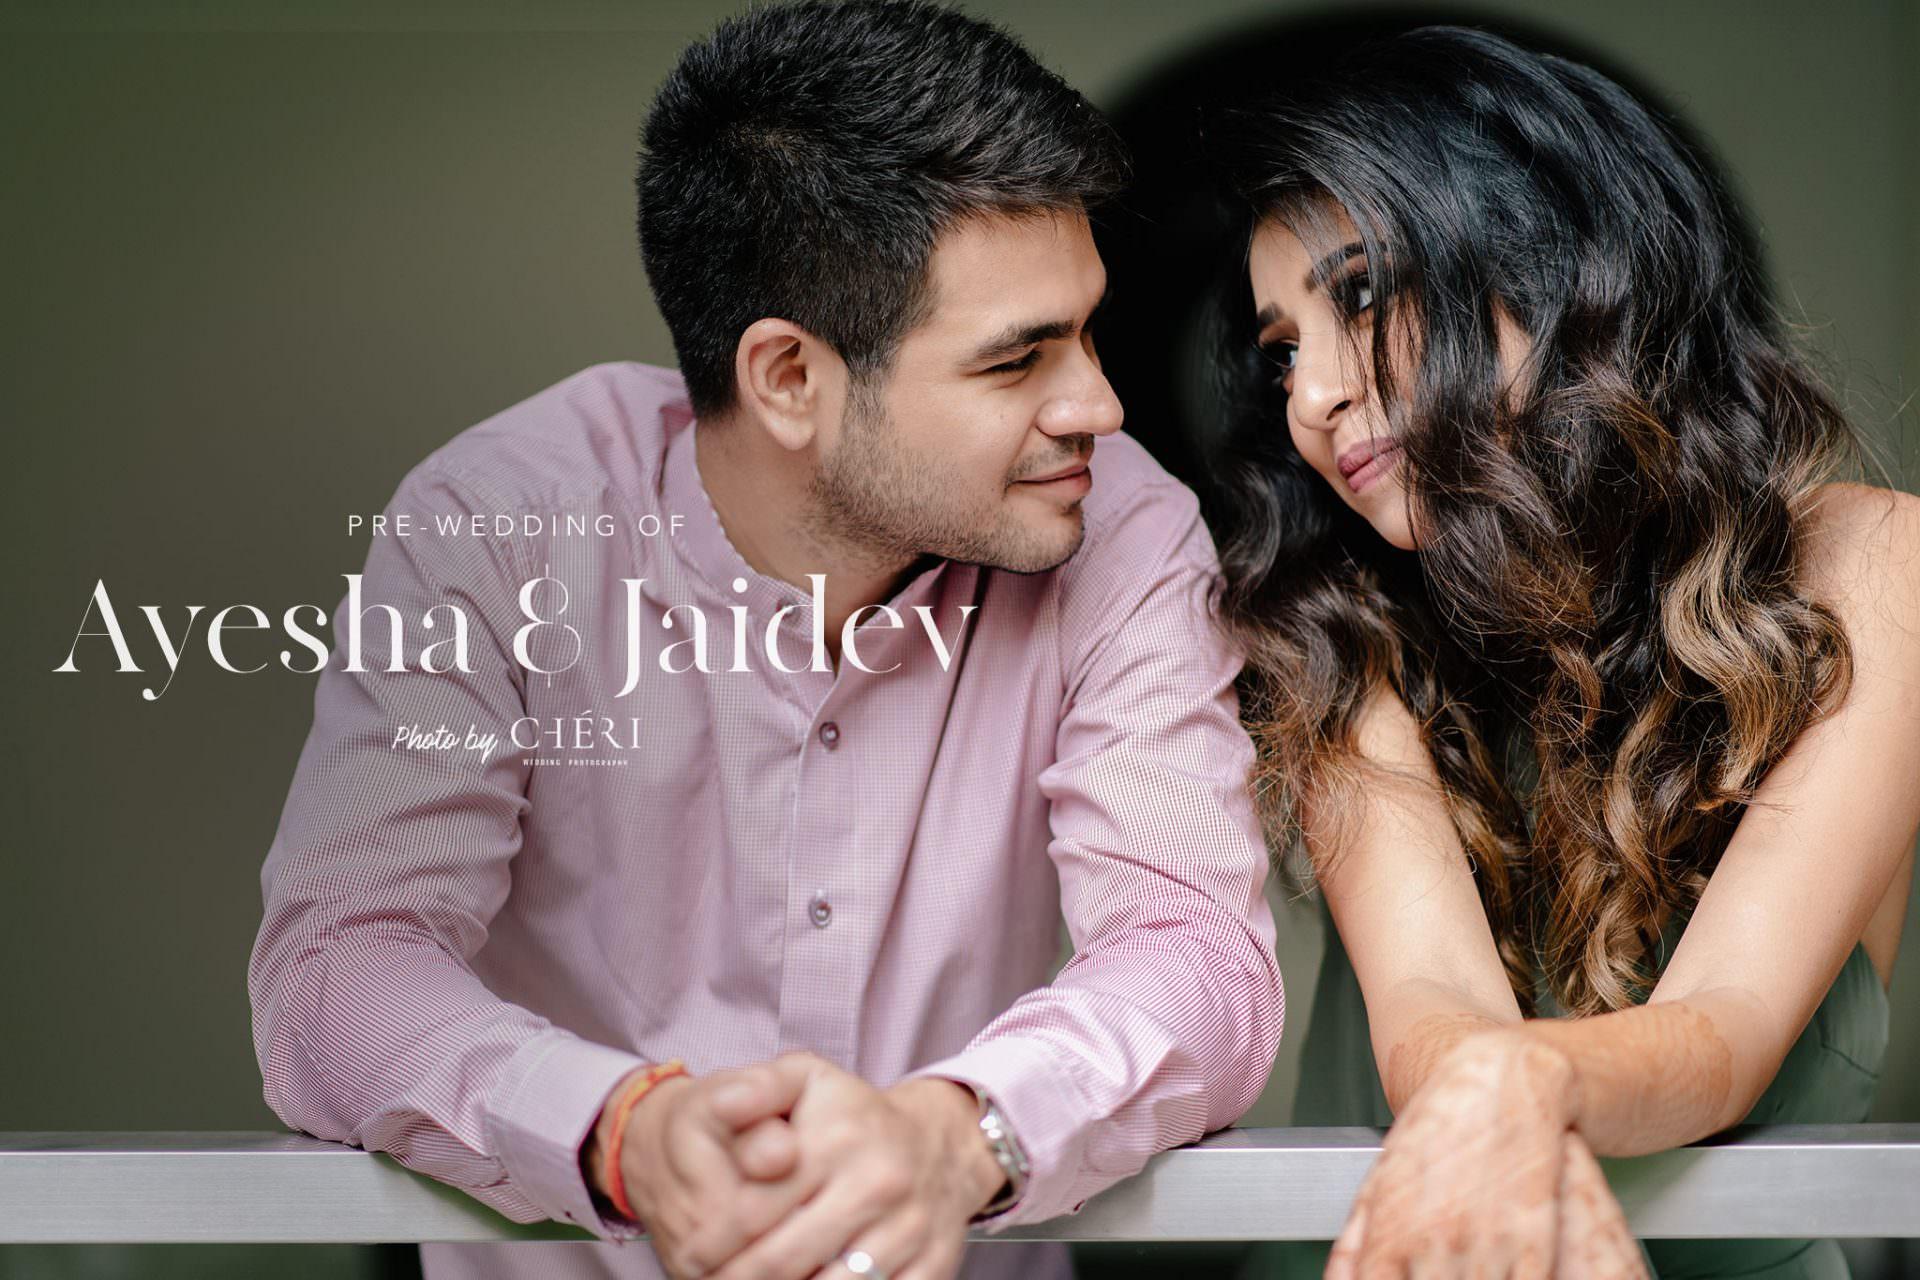 le meridien suvarnabhumi bangkok indian engagements photos pre wedding ayesha cover